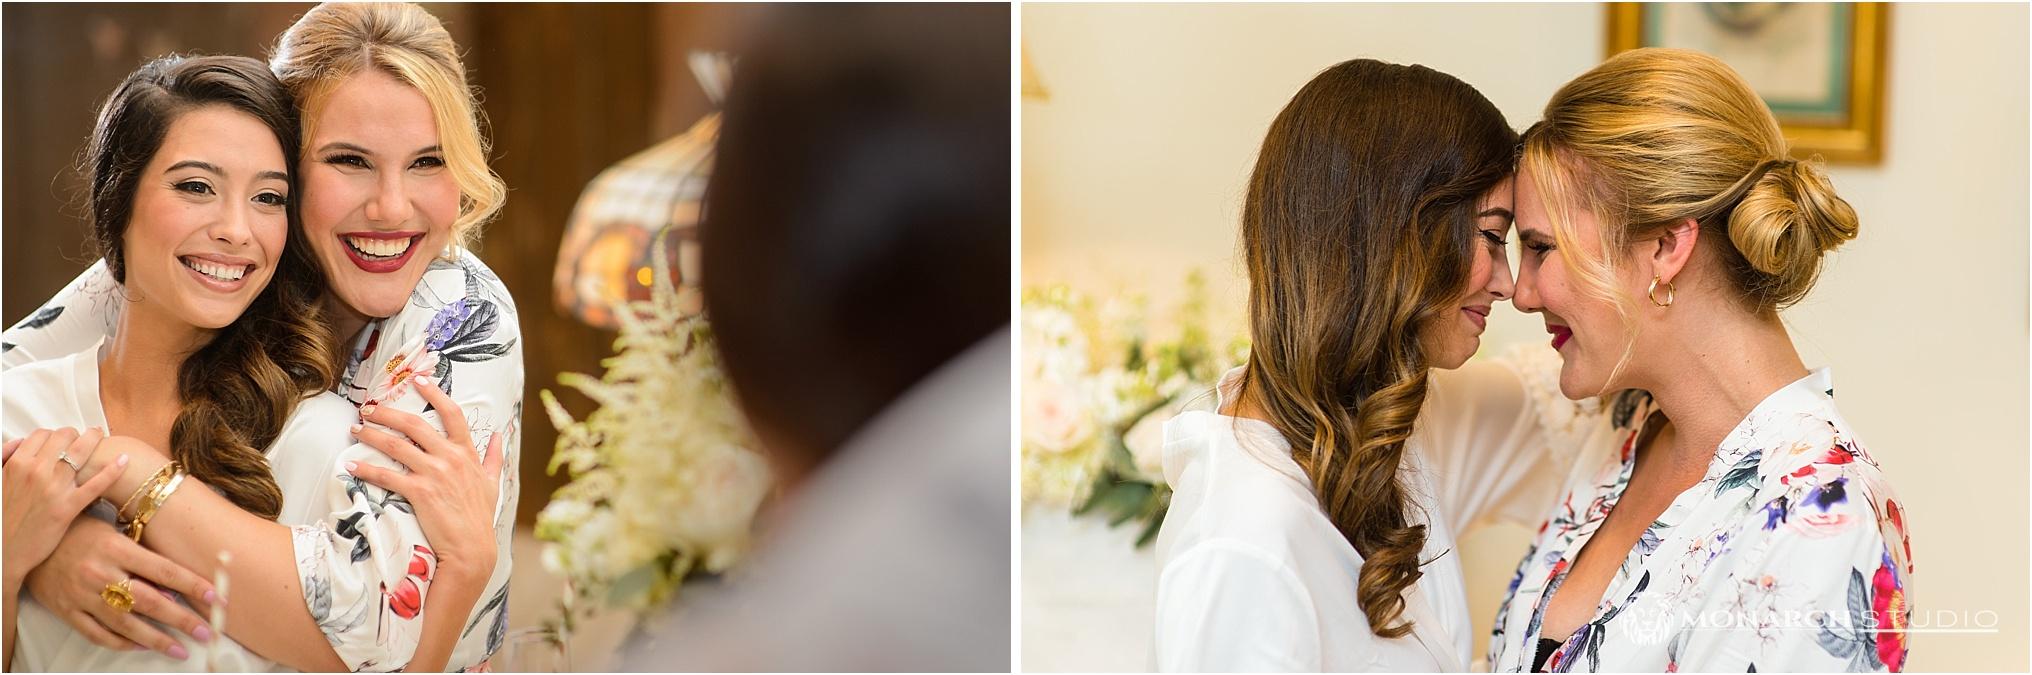 st-augustine-wedding-photographer-008.jpg